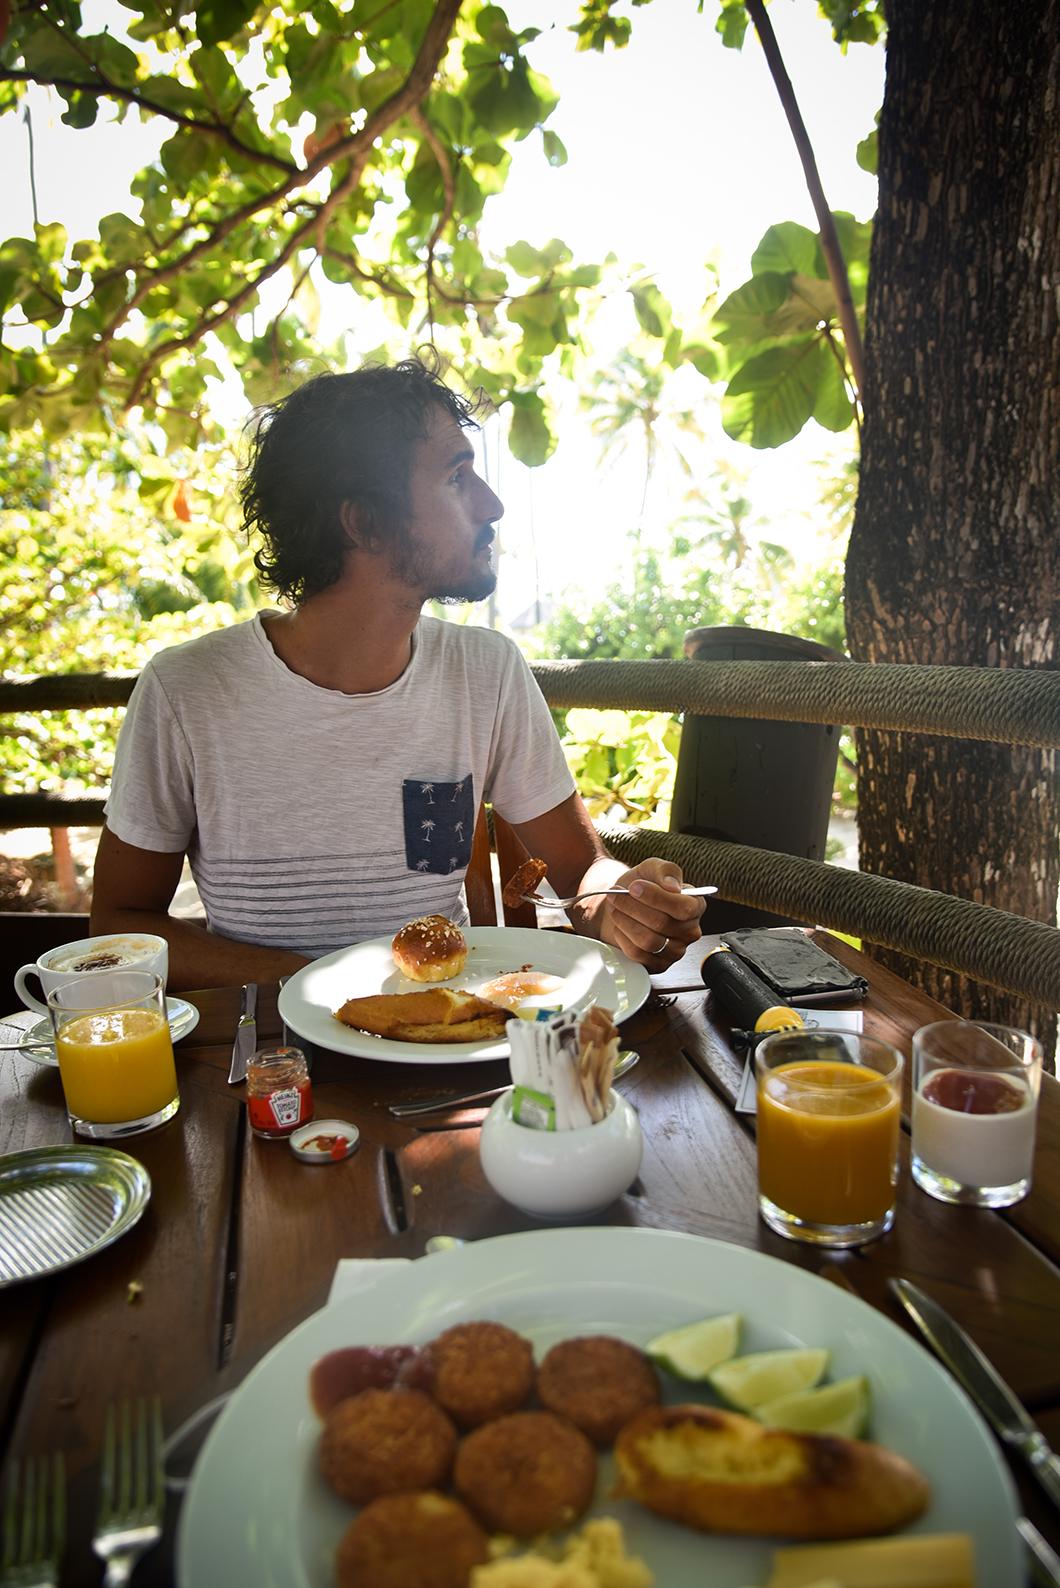 Petit déjeuner au Taha'a Island Resort and Spa